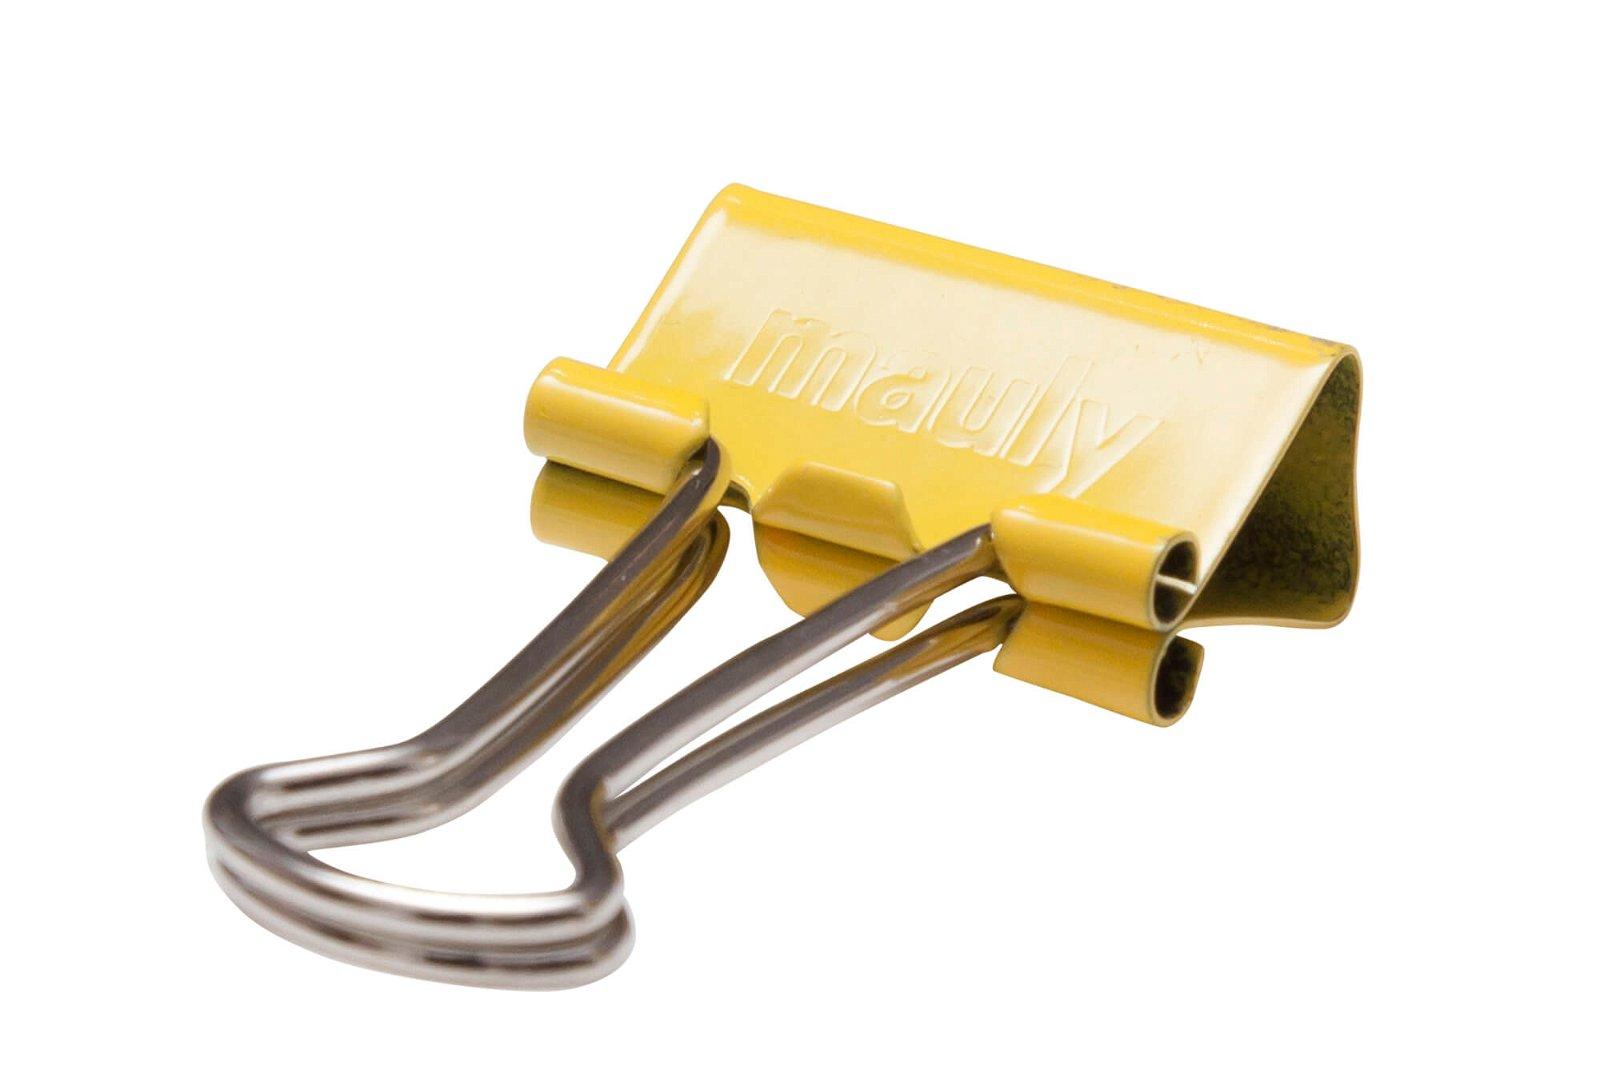 mauly 214, Breite 19 mm, 12 St./Ktn., gelb